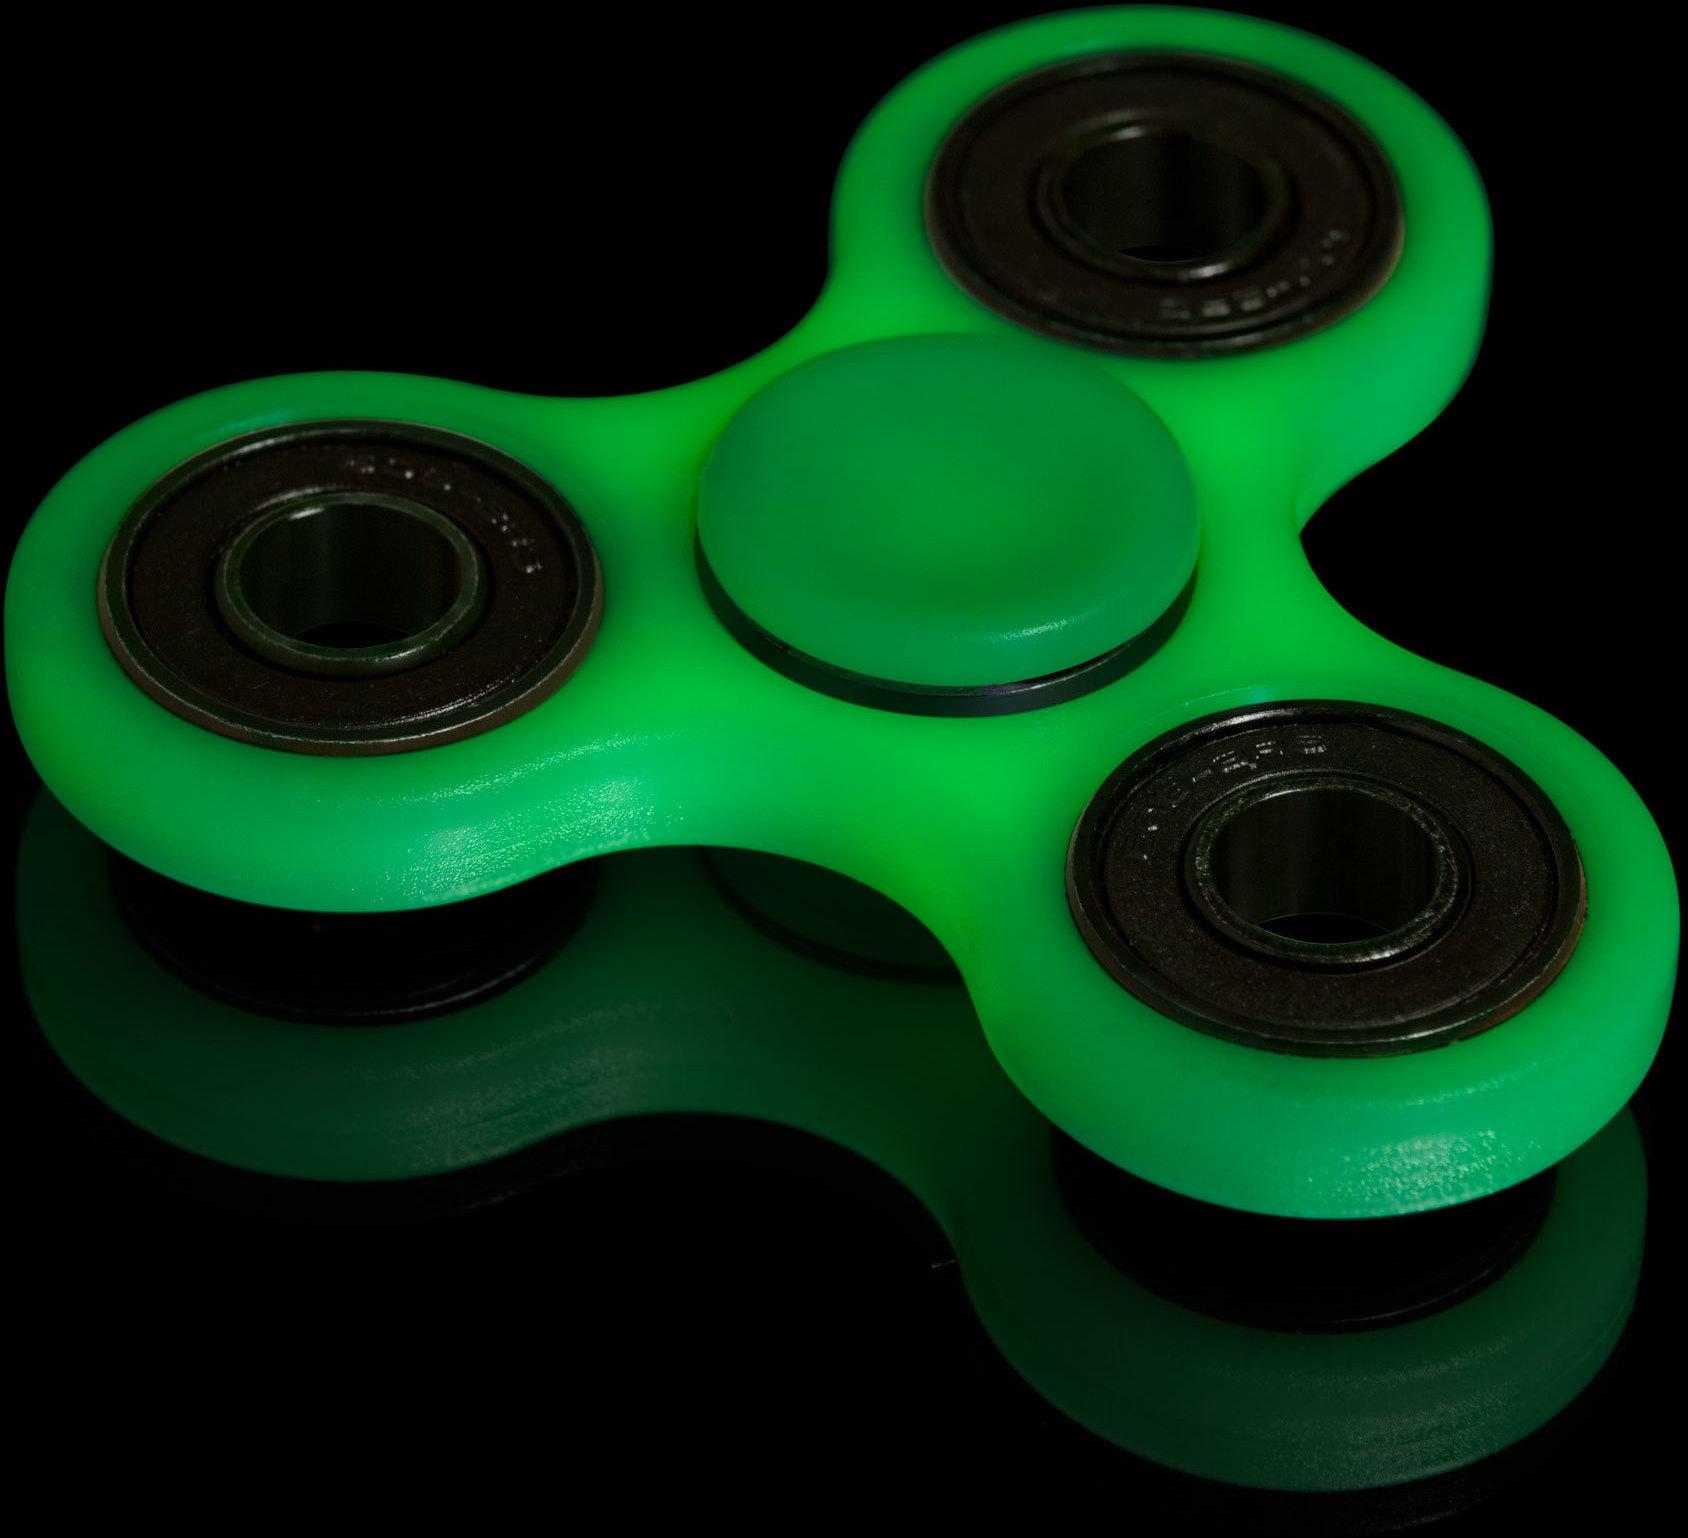 Fuj:tech Fidget Spinner ‐sormihyrrä, TRIPLAPAKKAUS, pimeässä hohtava x 3 kpl – Stressilelut ...